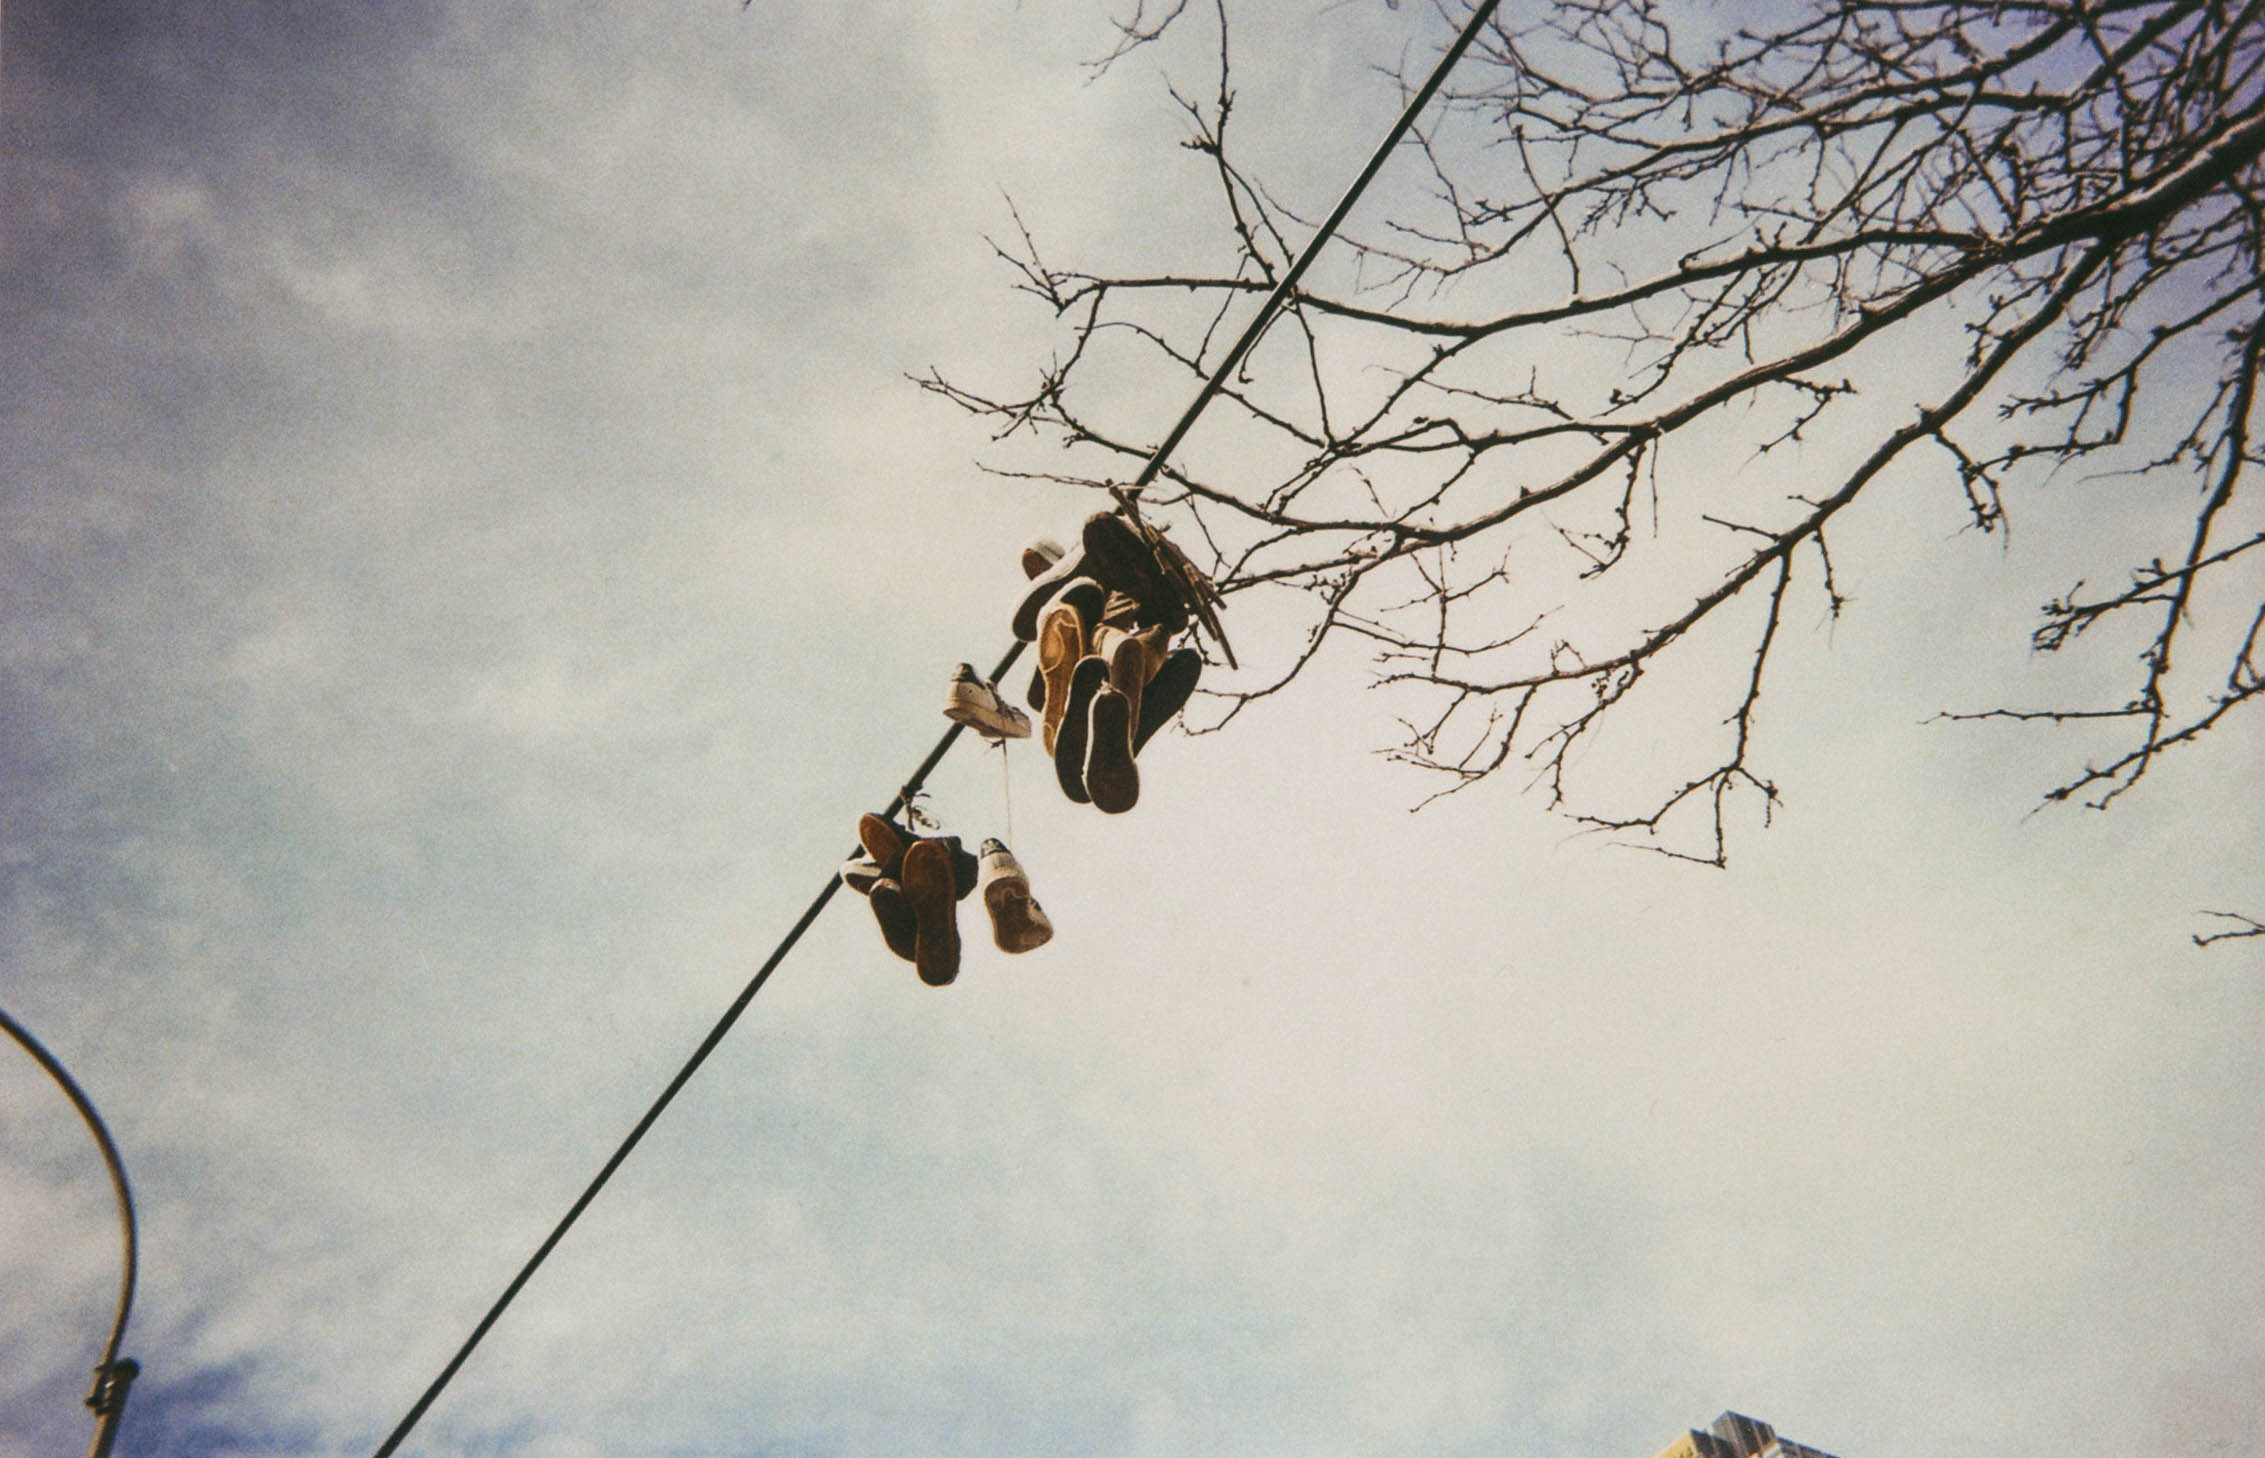 film nicole pumped up kicks sneakers on a phone line